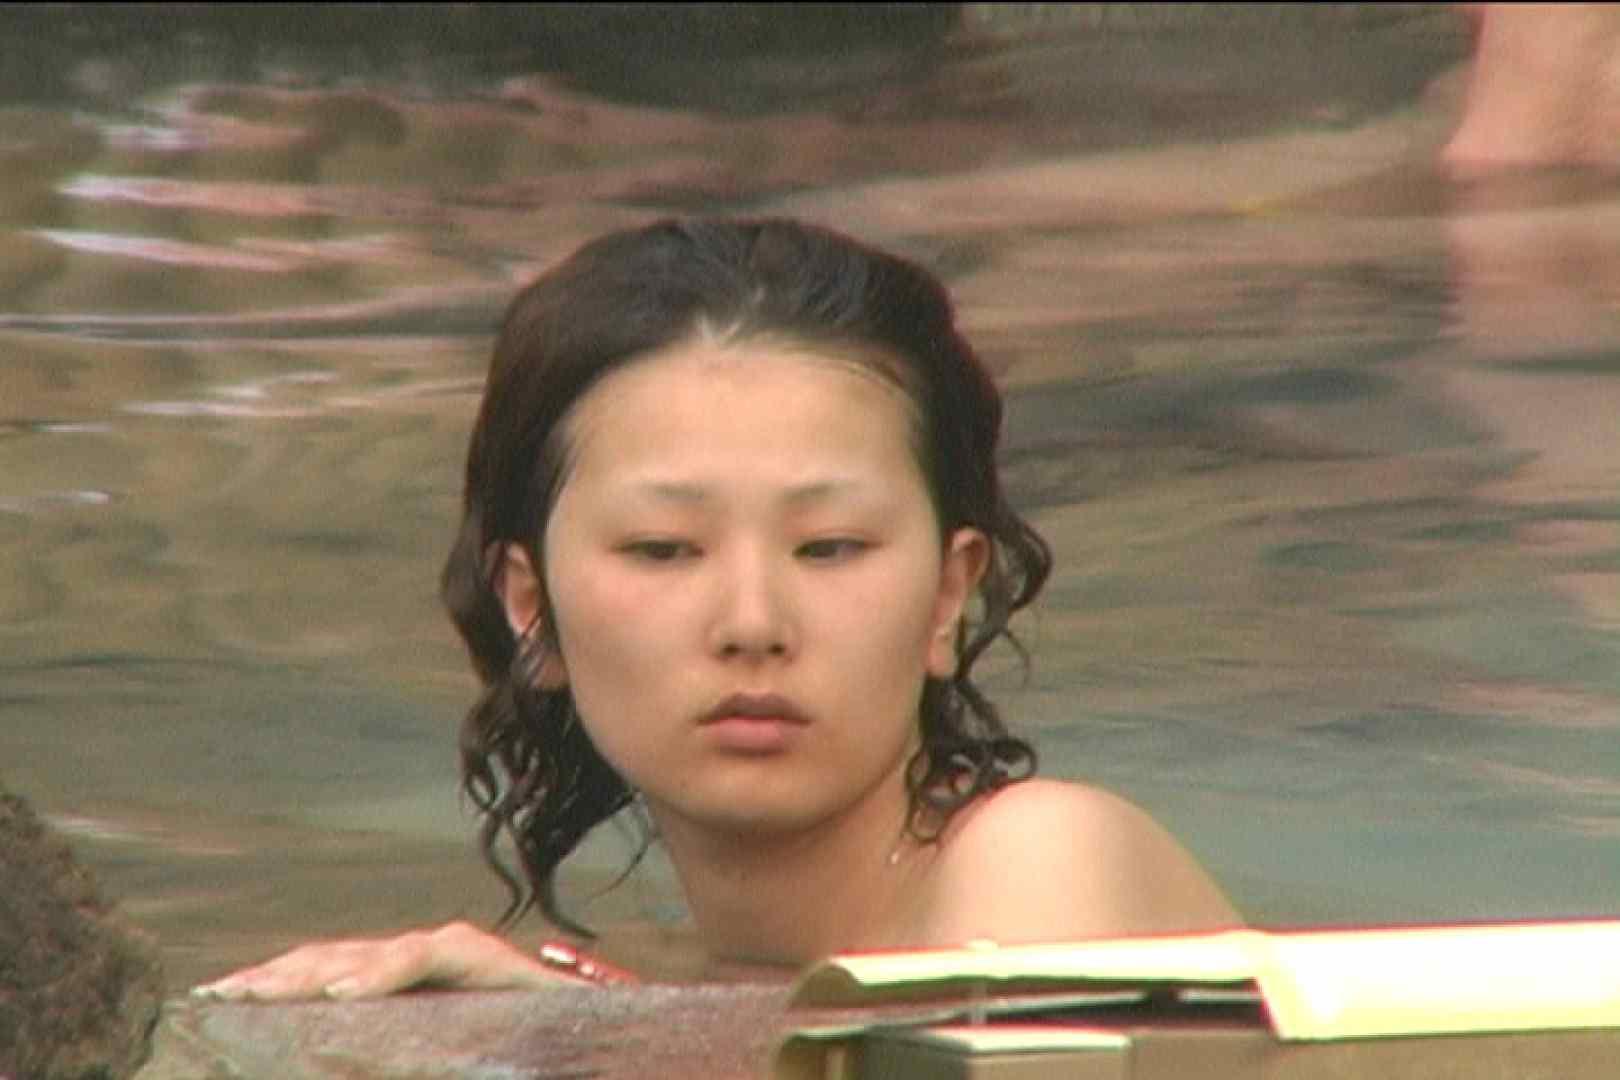 Aquaな露天風呂Vol.131 女体盗撮 覗きスケベ動画紹介 82連発 35